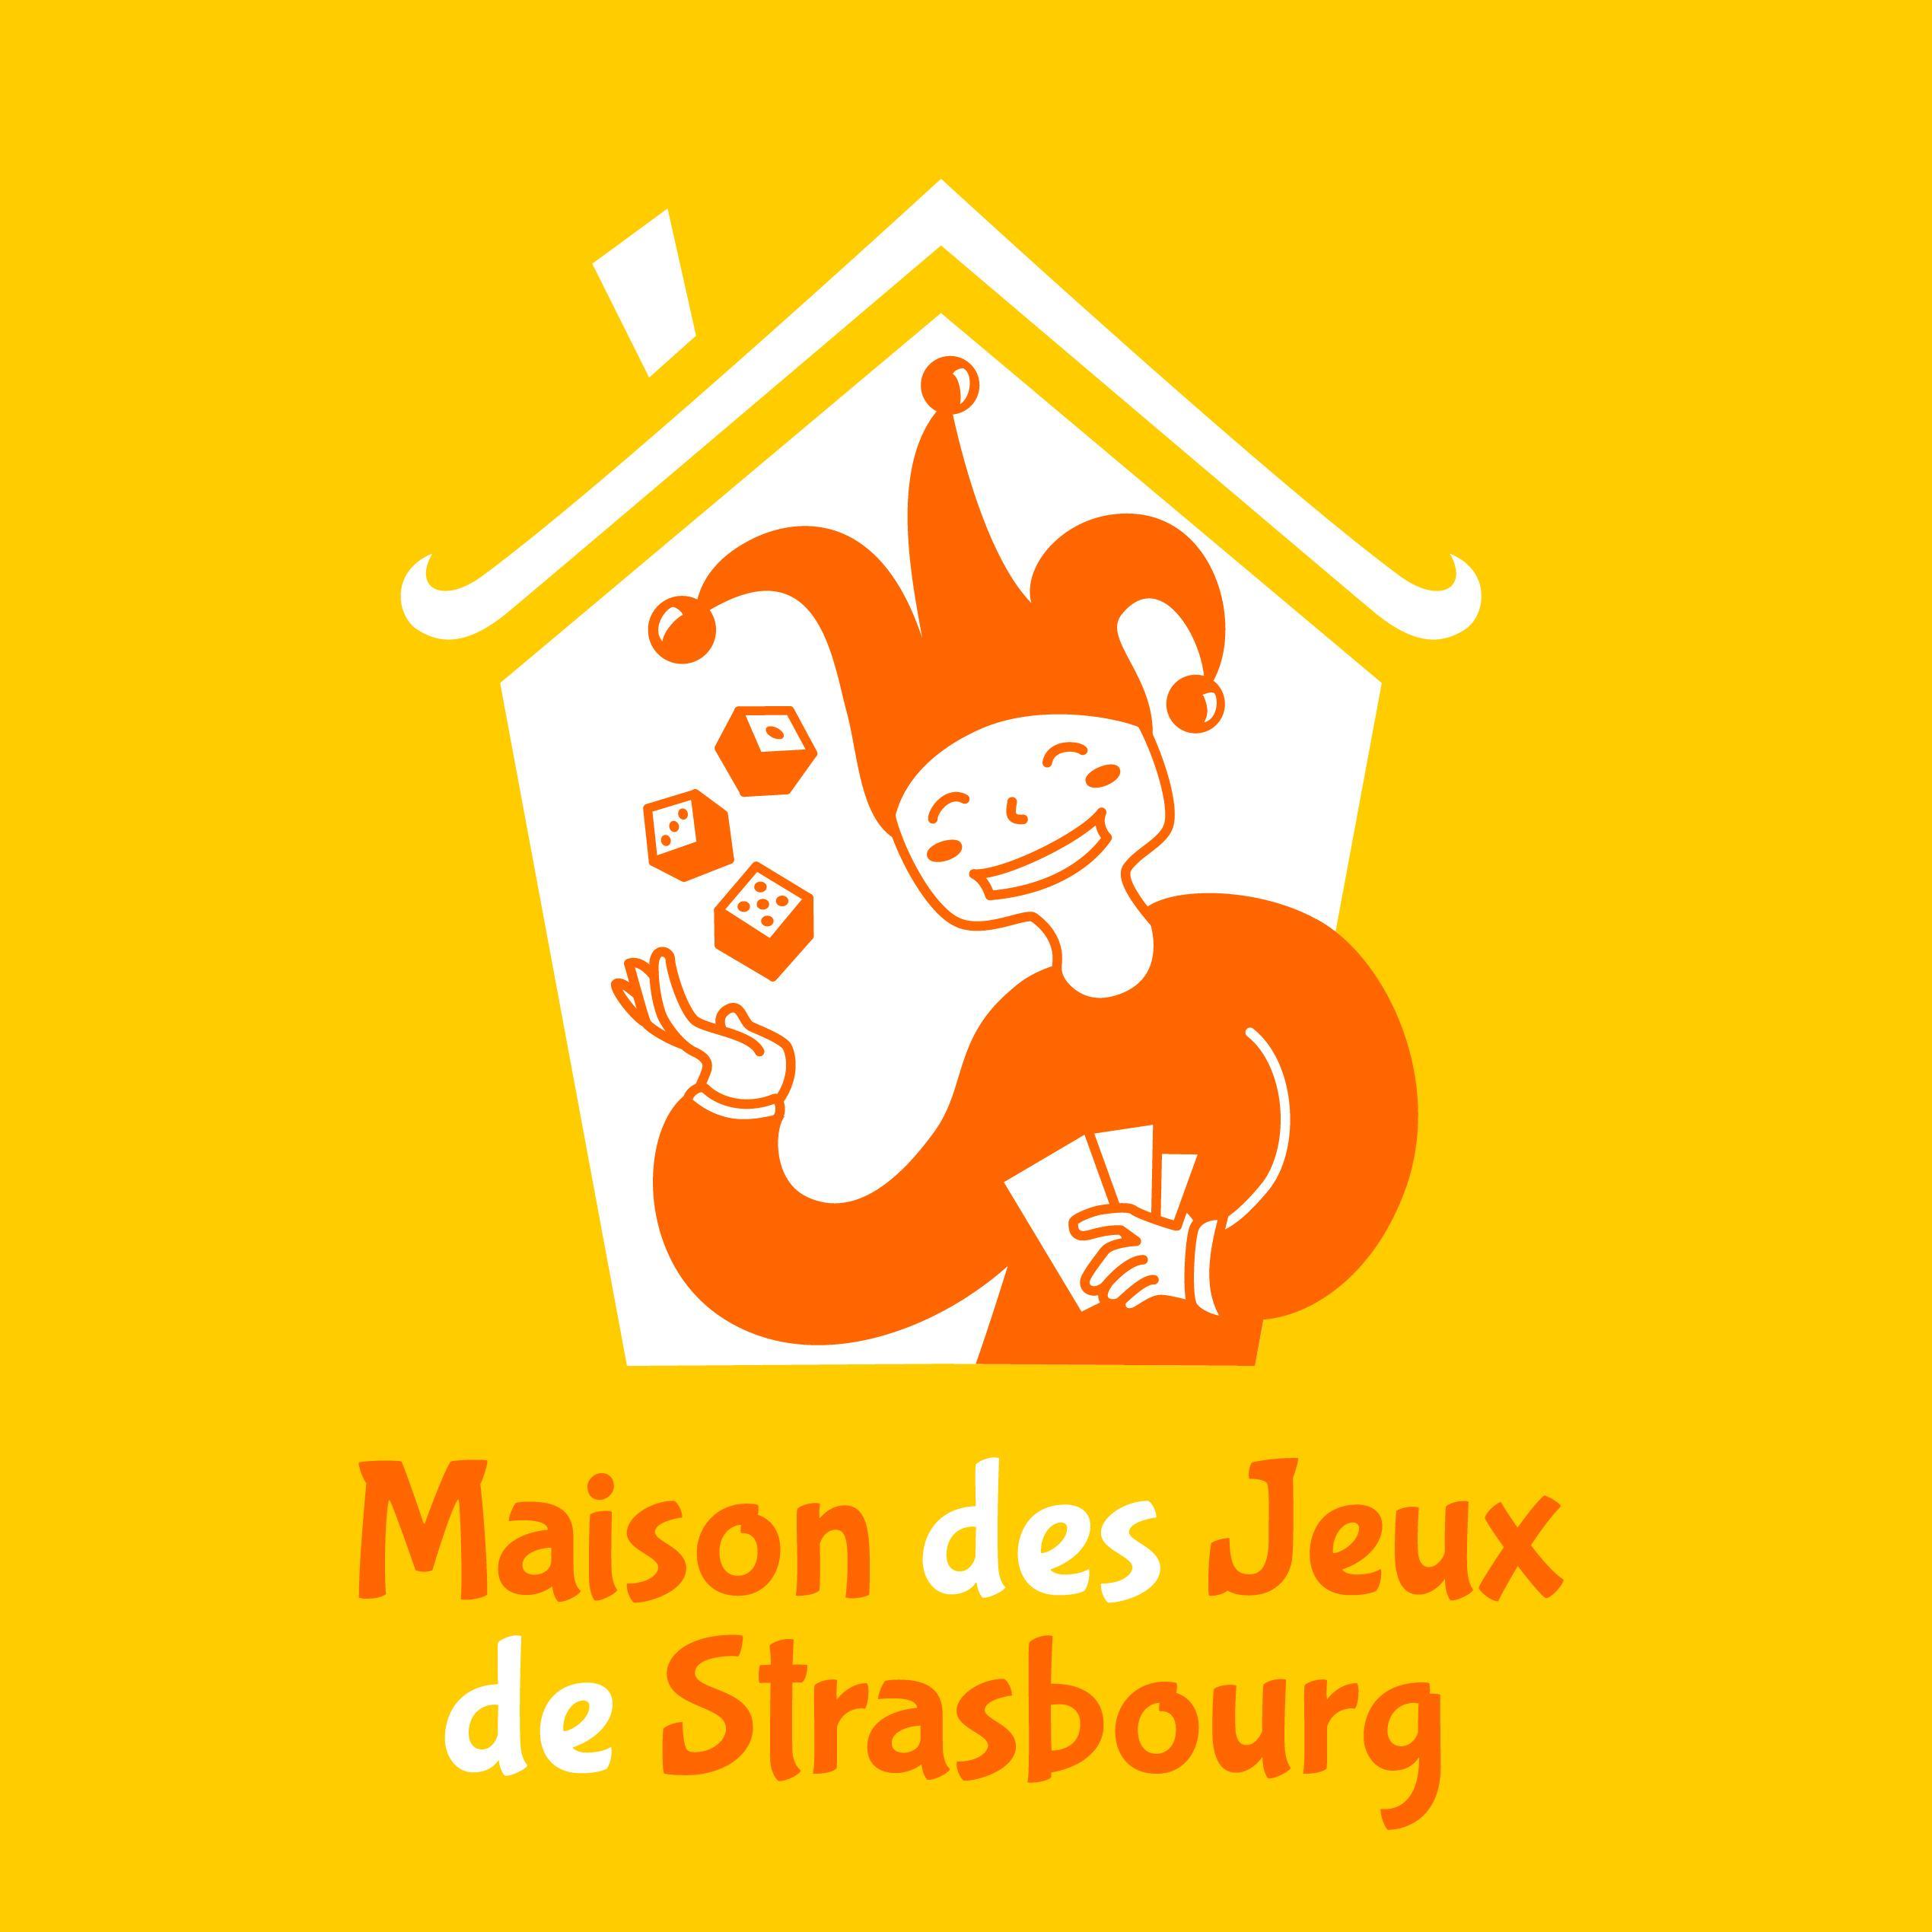 logo-mdj-couleur-fondjaune-01